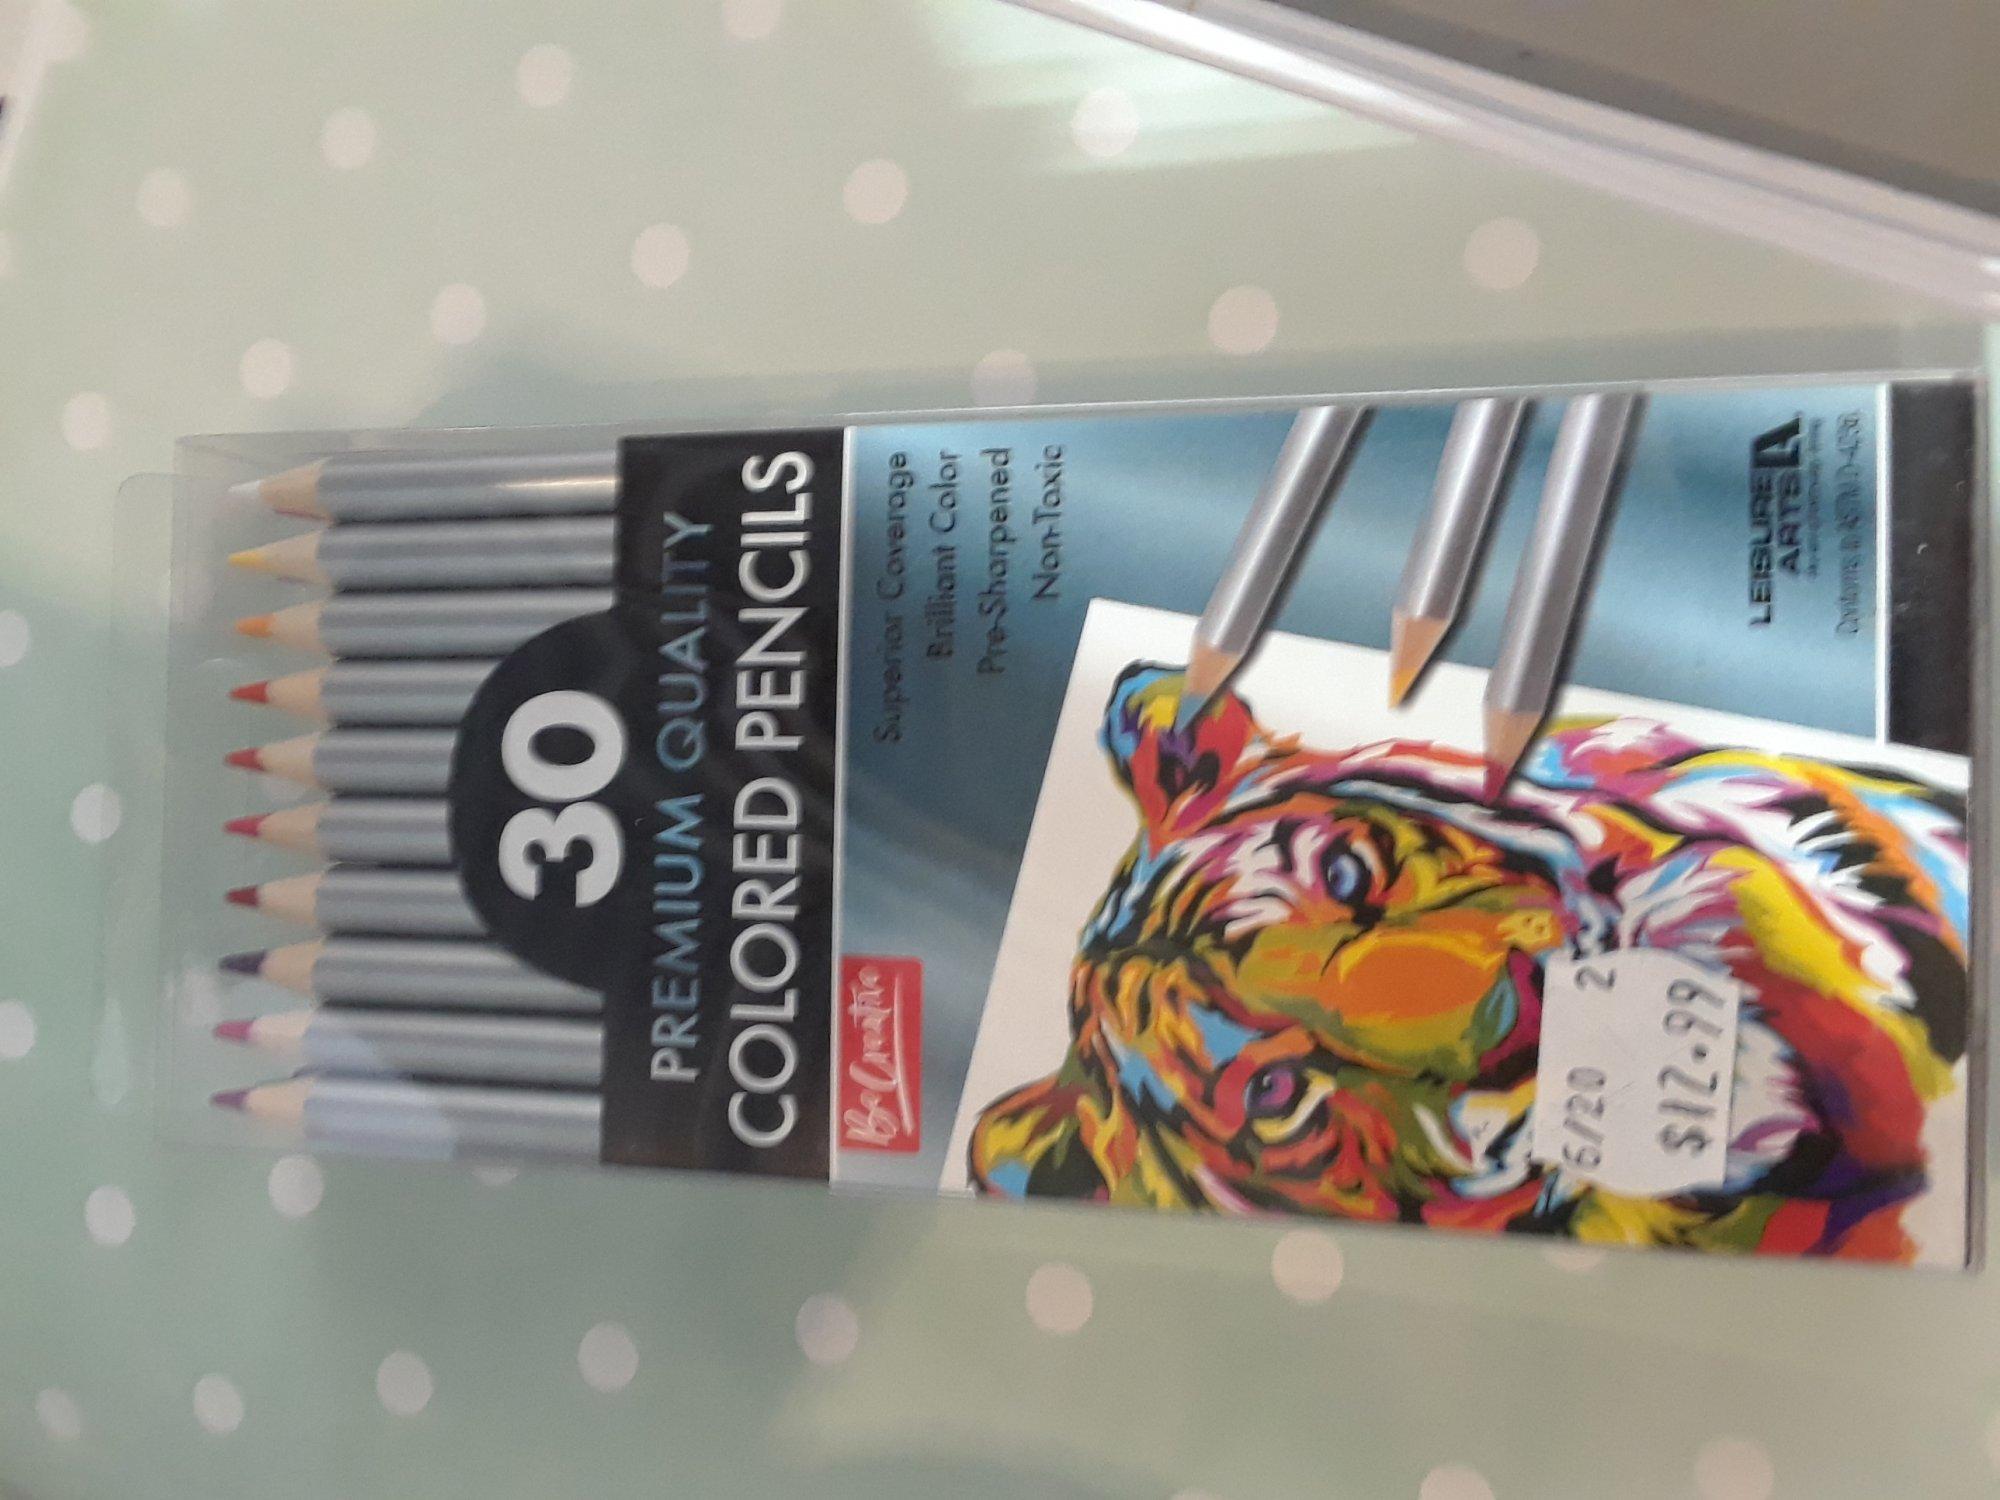 COLORED PENCILS PREMIUM by Leisure Arts 30 colors